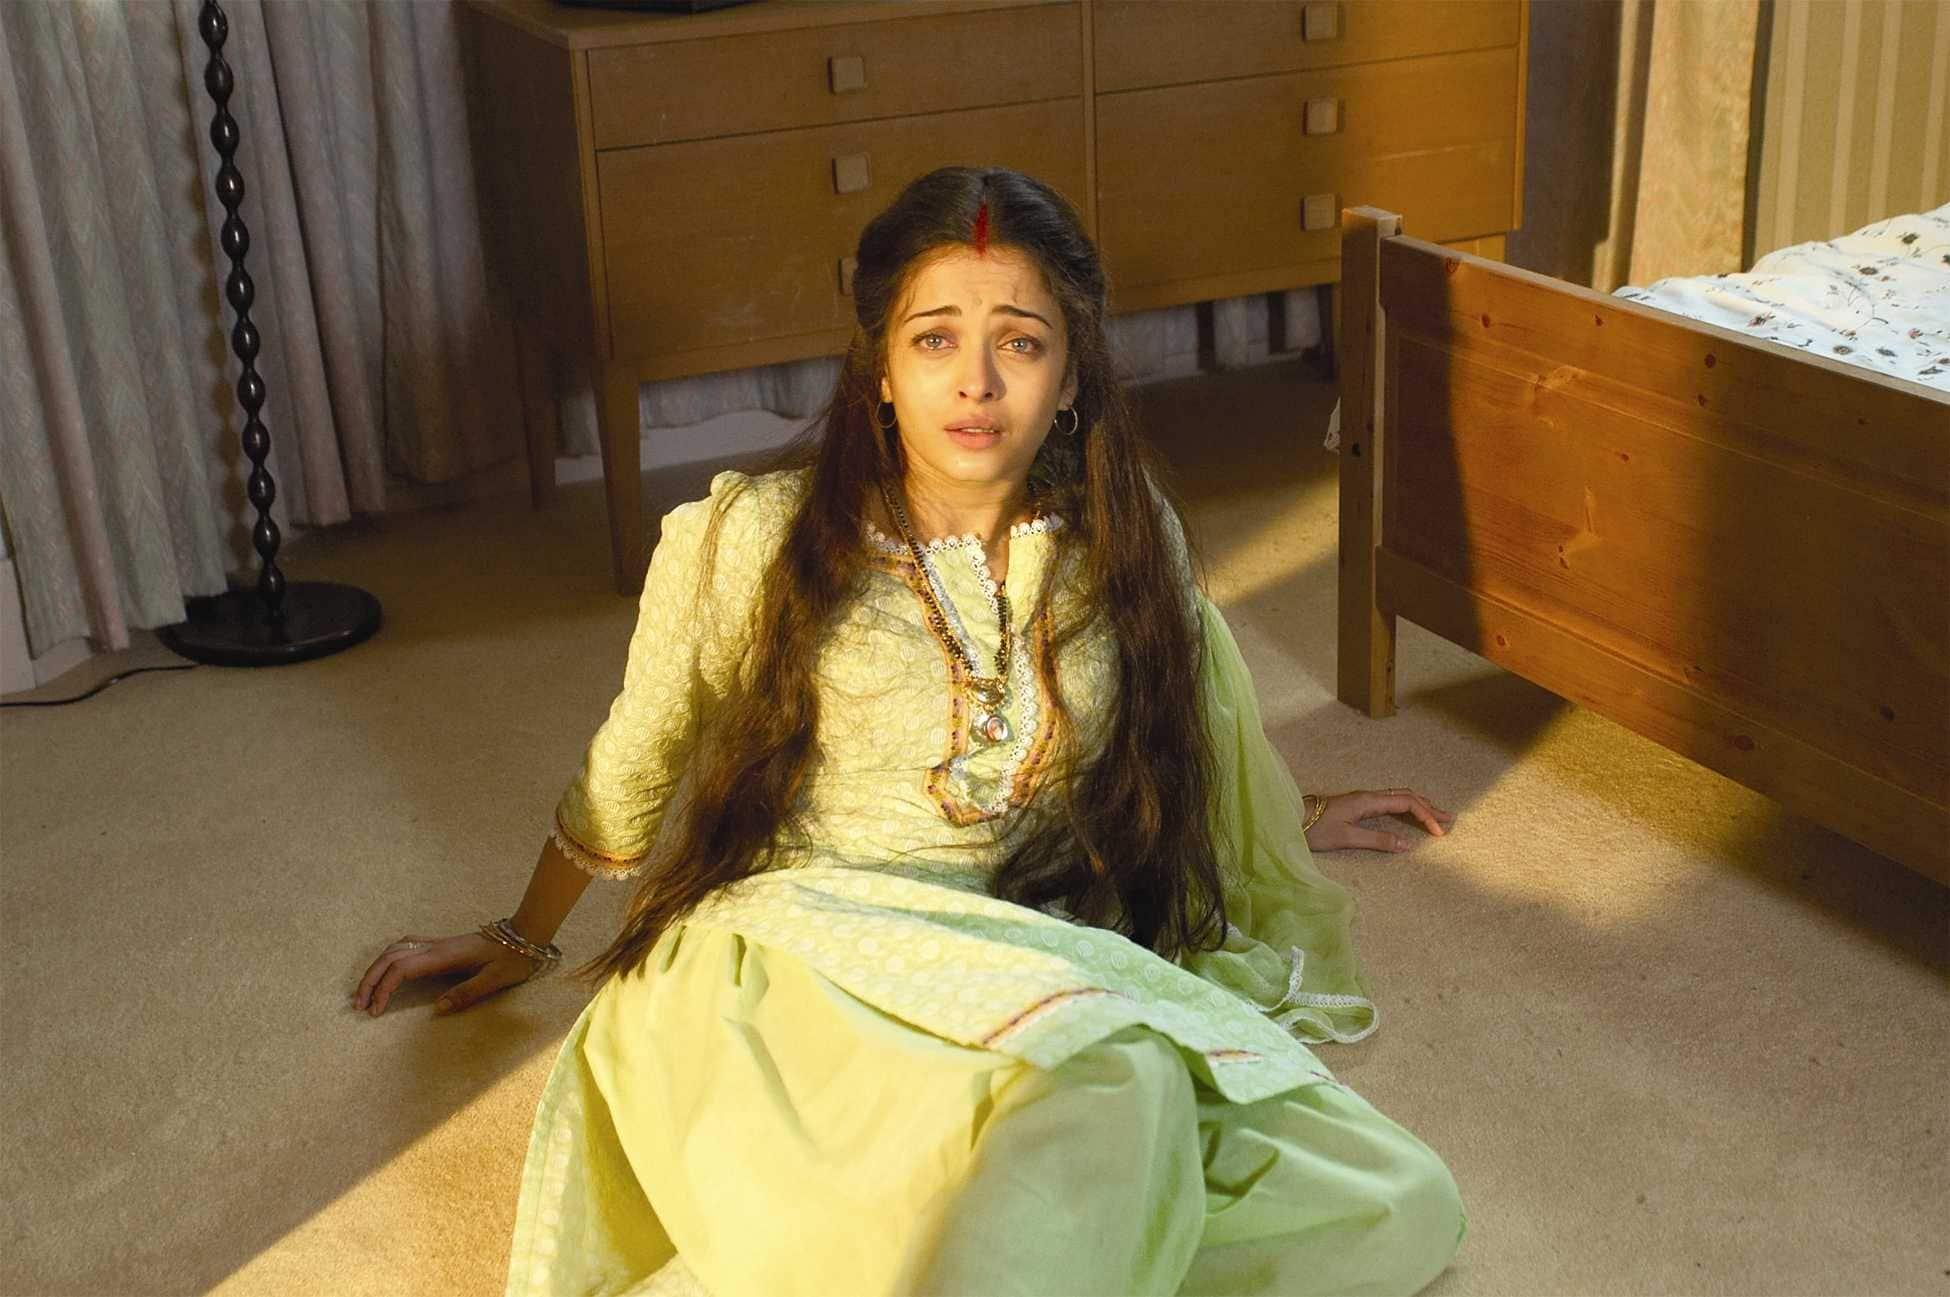 RANKED: 5 Best Performances Of Aishwarya Rai